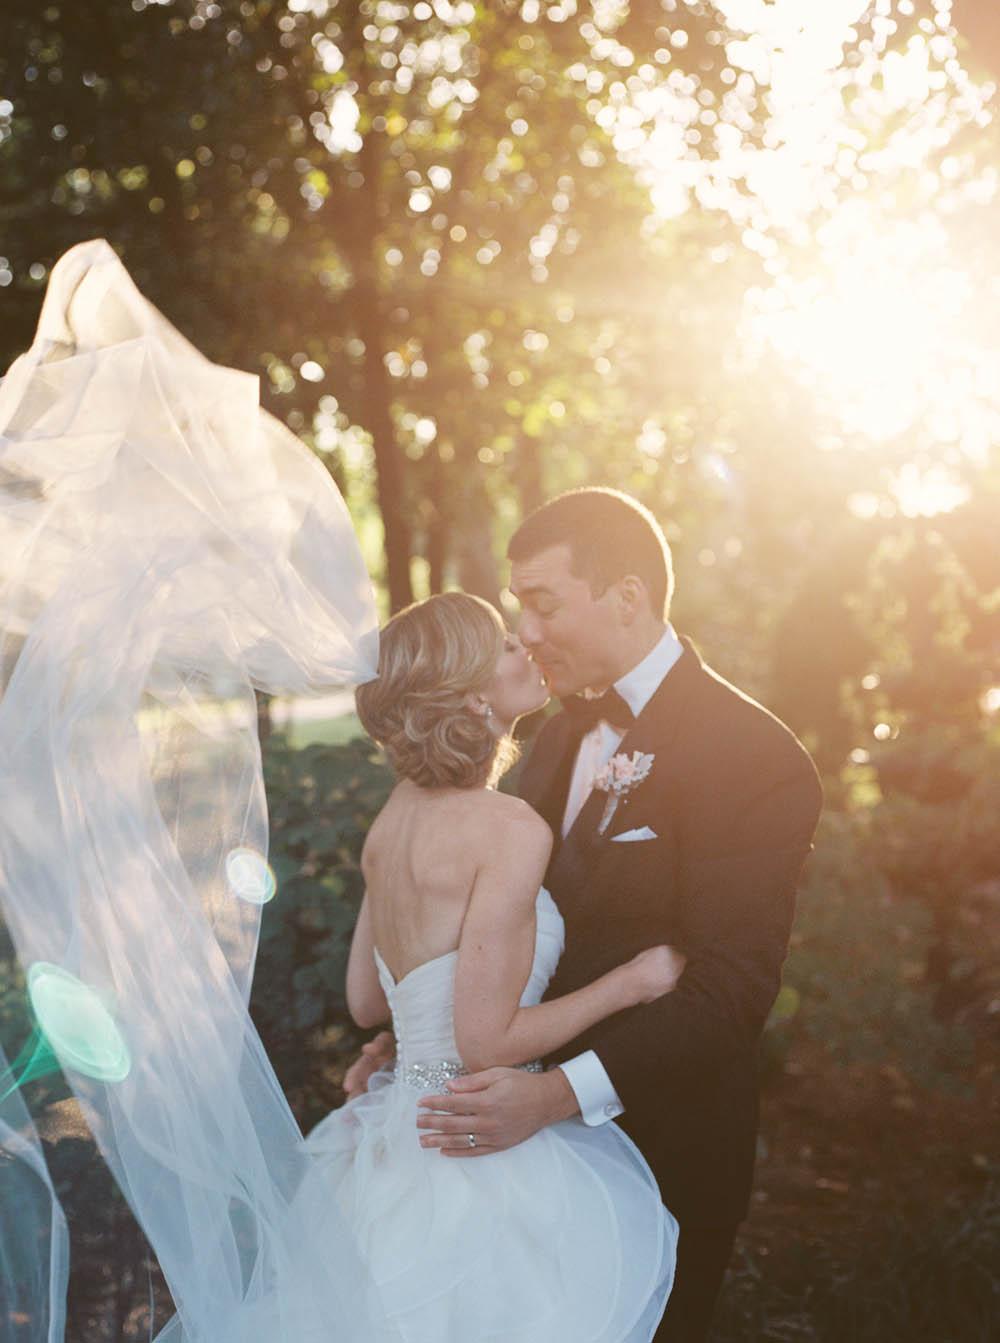 riverwood mansion film wedding photographer natural documentary ©2016abigailbobophotography-26.jpg